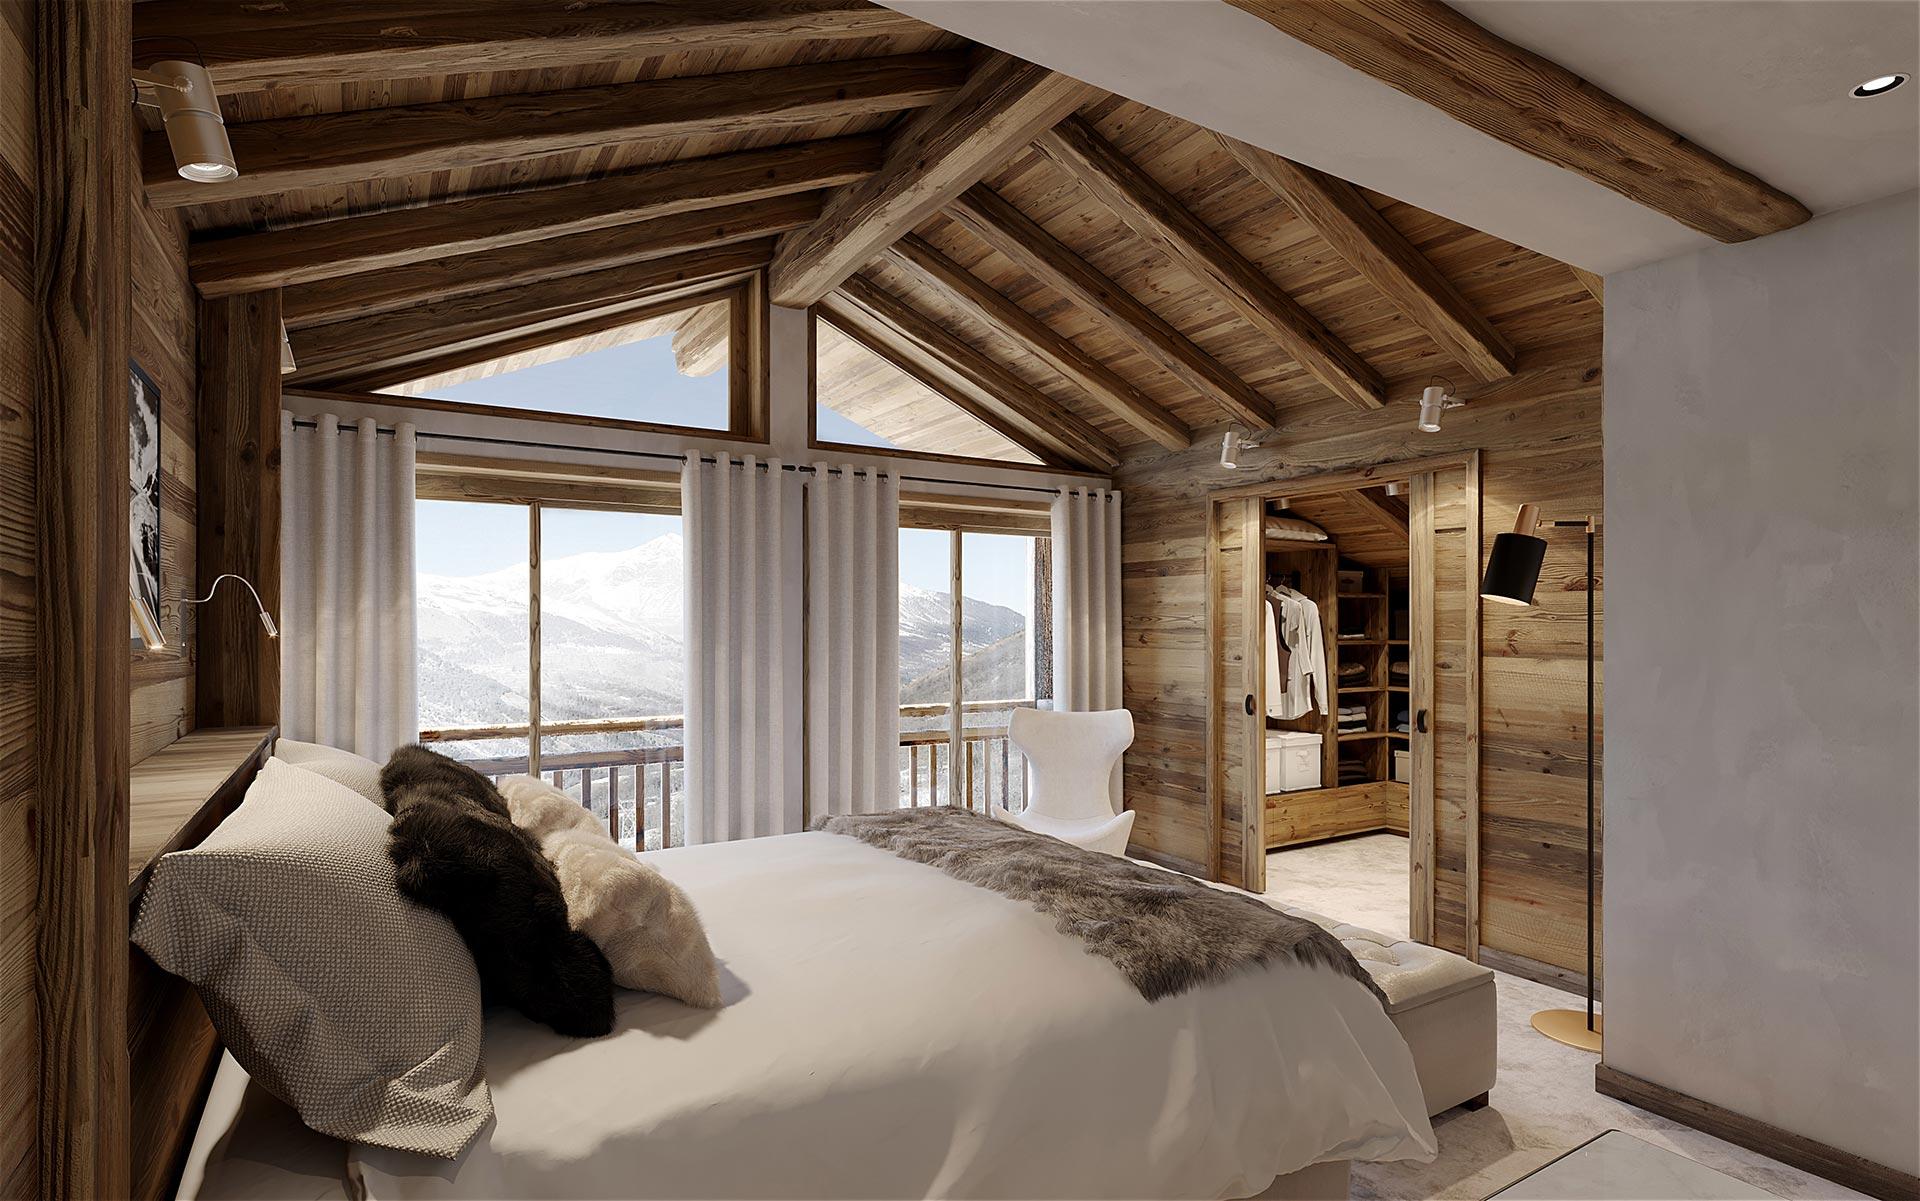 3D Render of a bedroom in a luxury Chalet in Chamonix